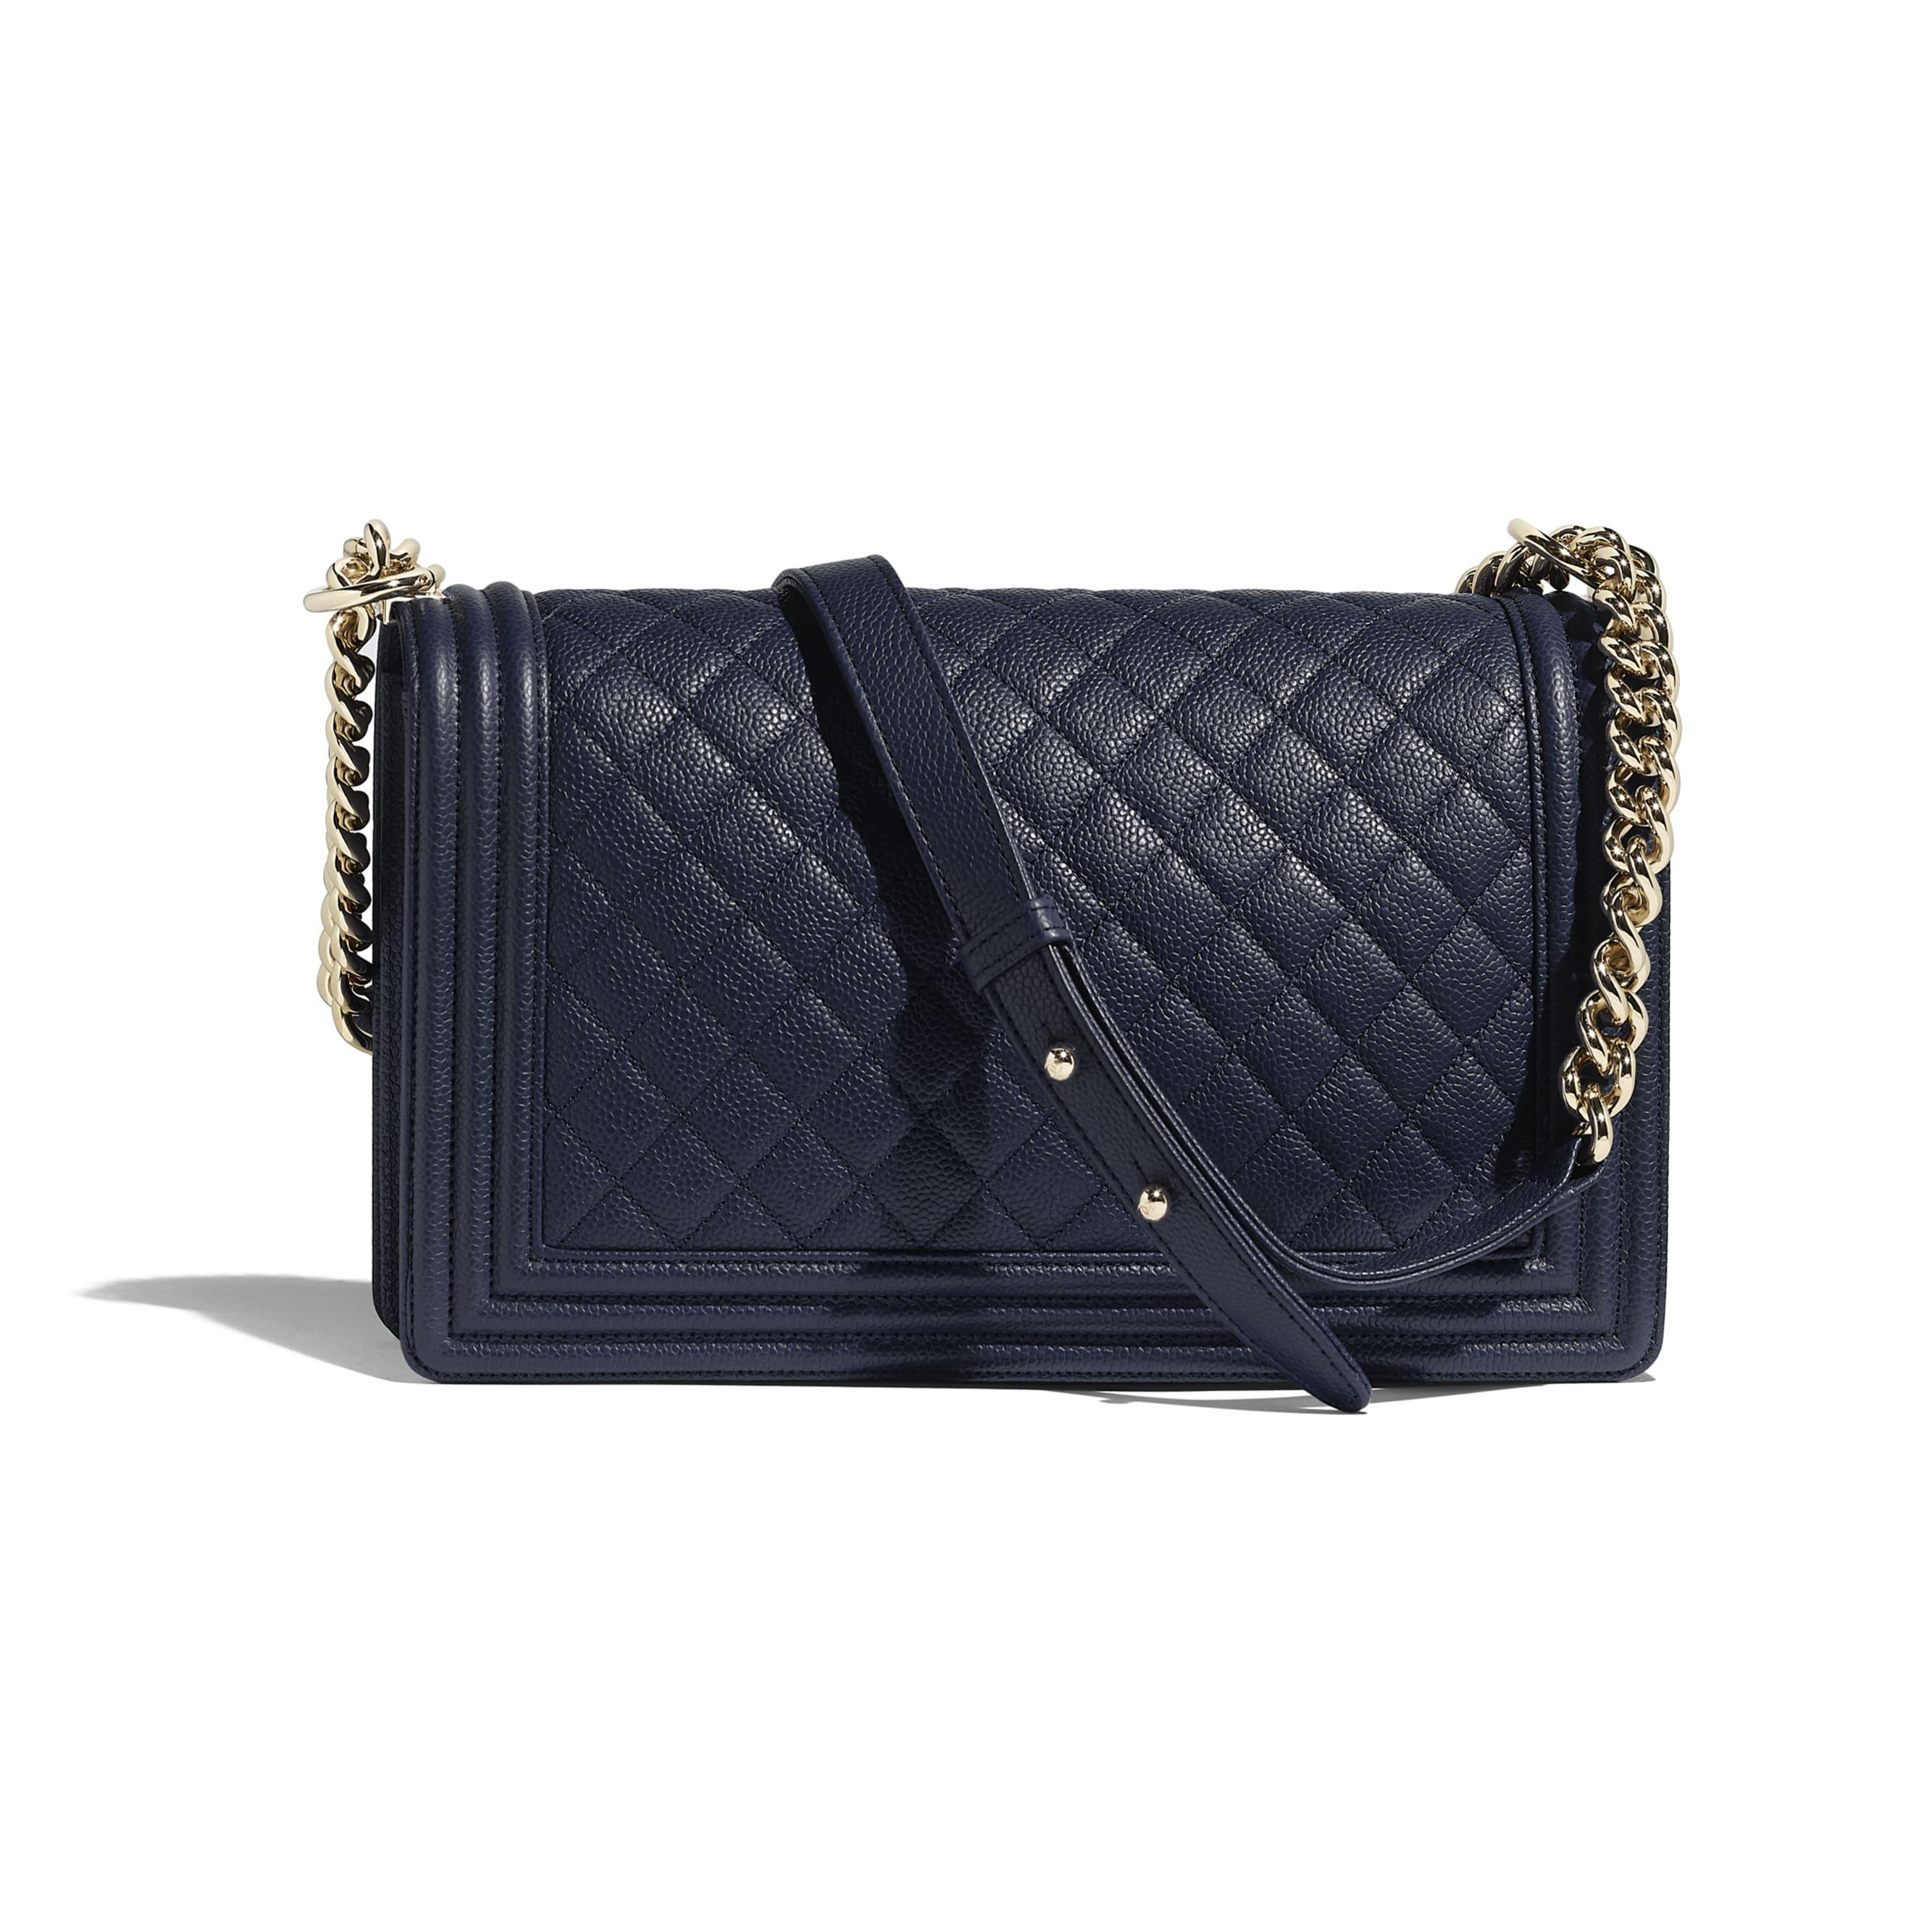 Large BOY CHANEL Handbag - Navy Blue - Grained Calfskin & Gold-Tone Metal - CHANEL - Alternative view - see standard sized version